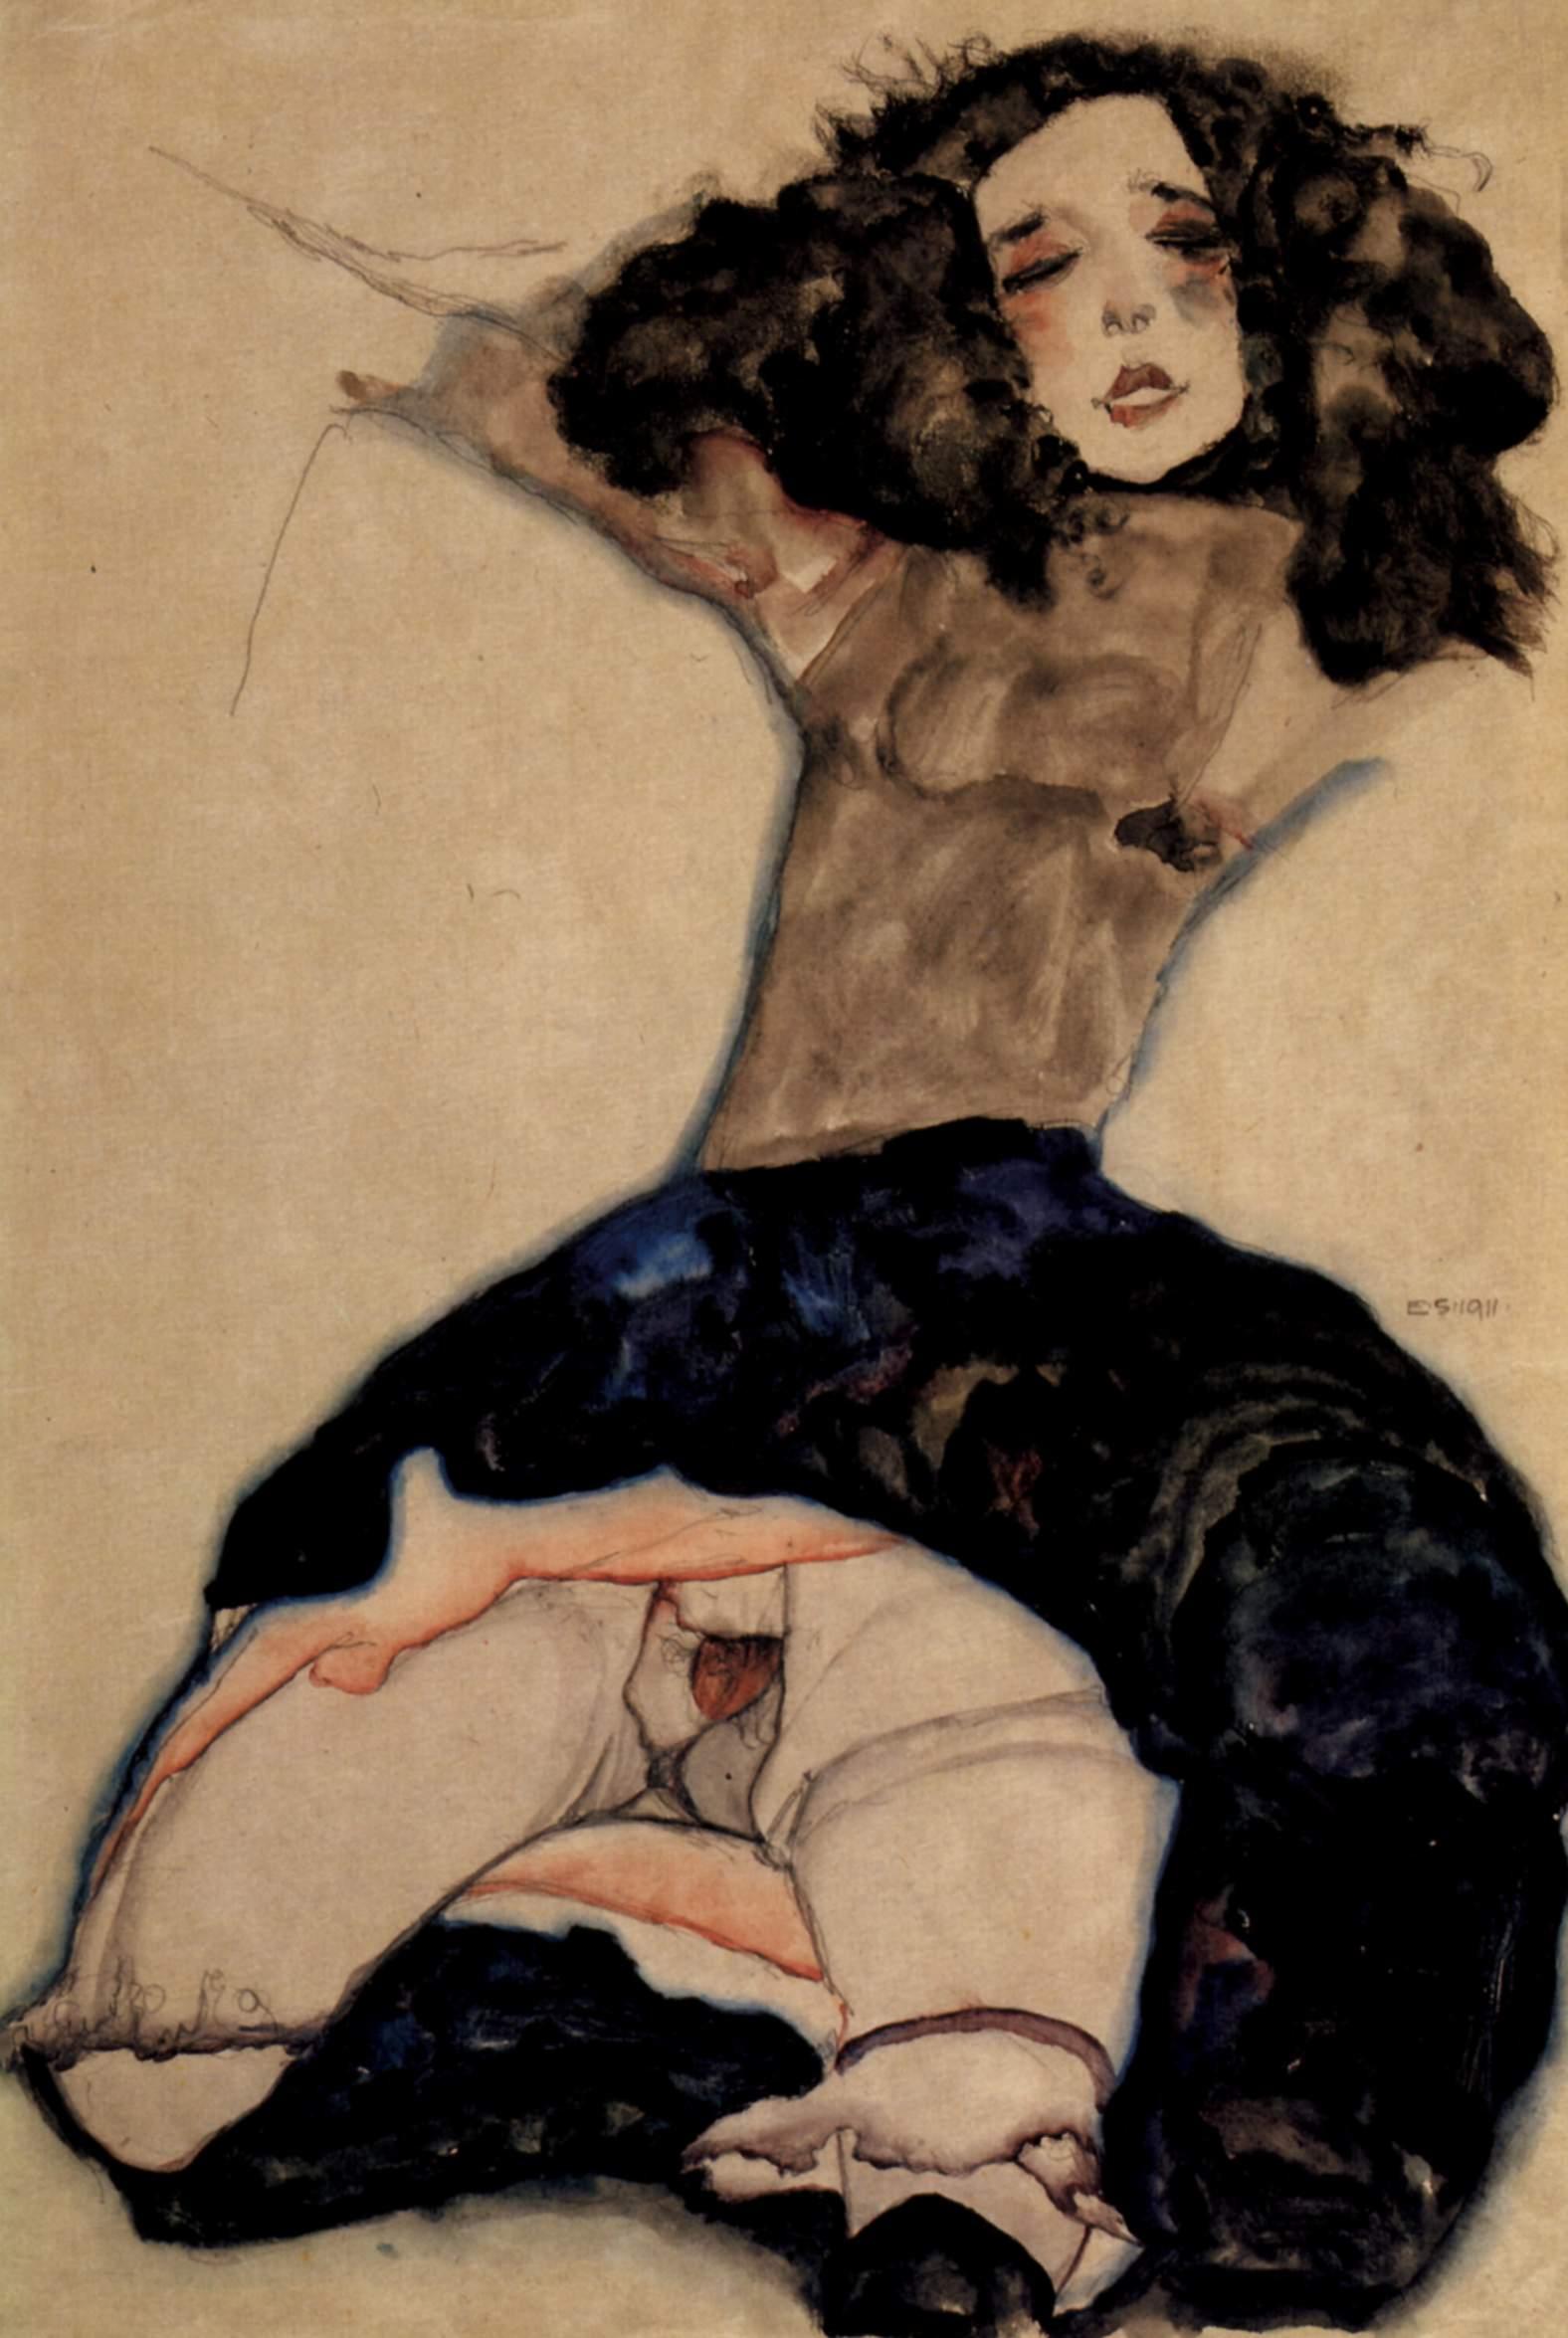 erotiske jenter erotic pics